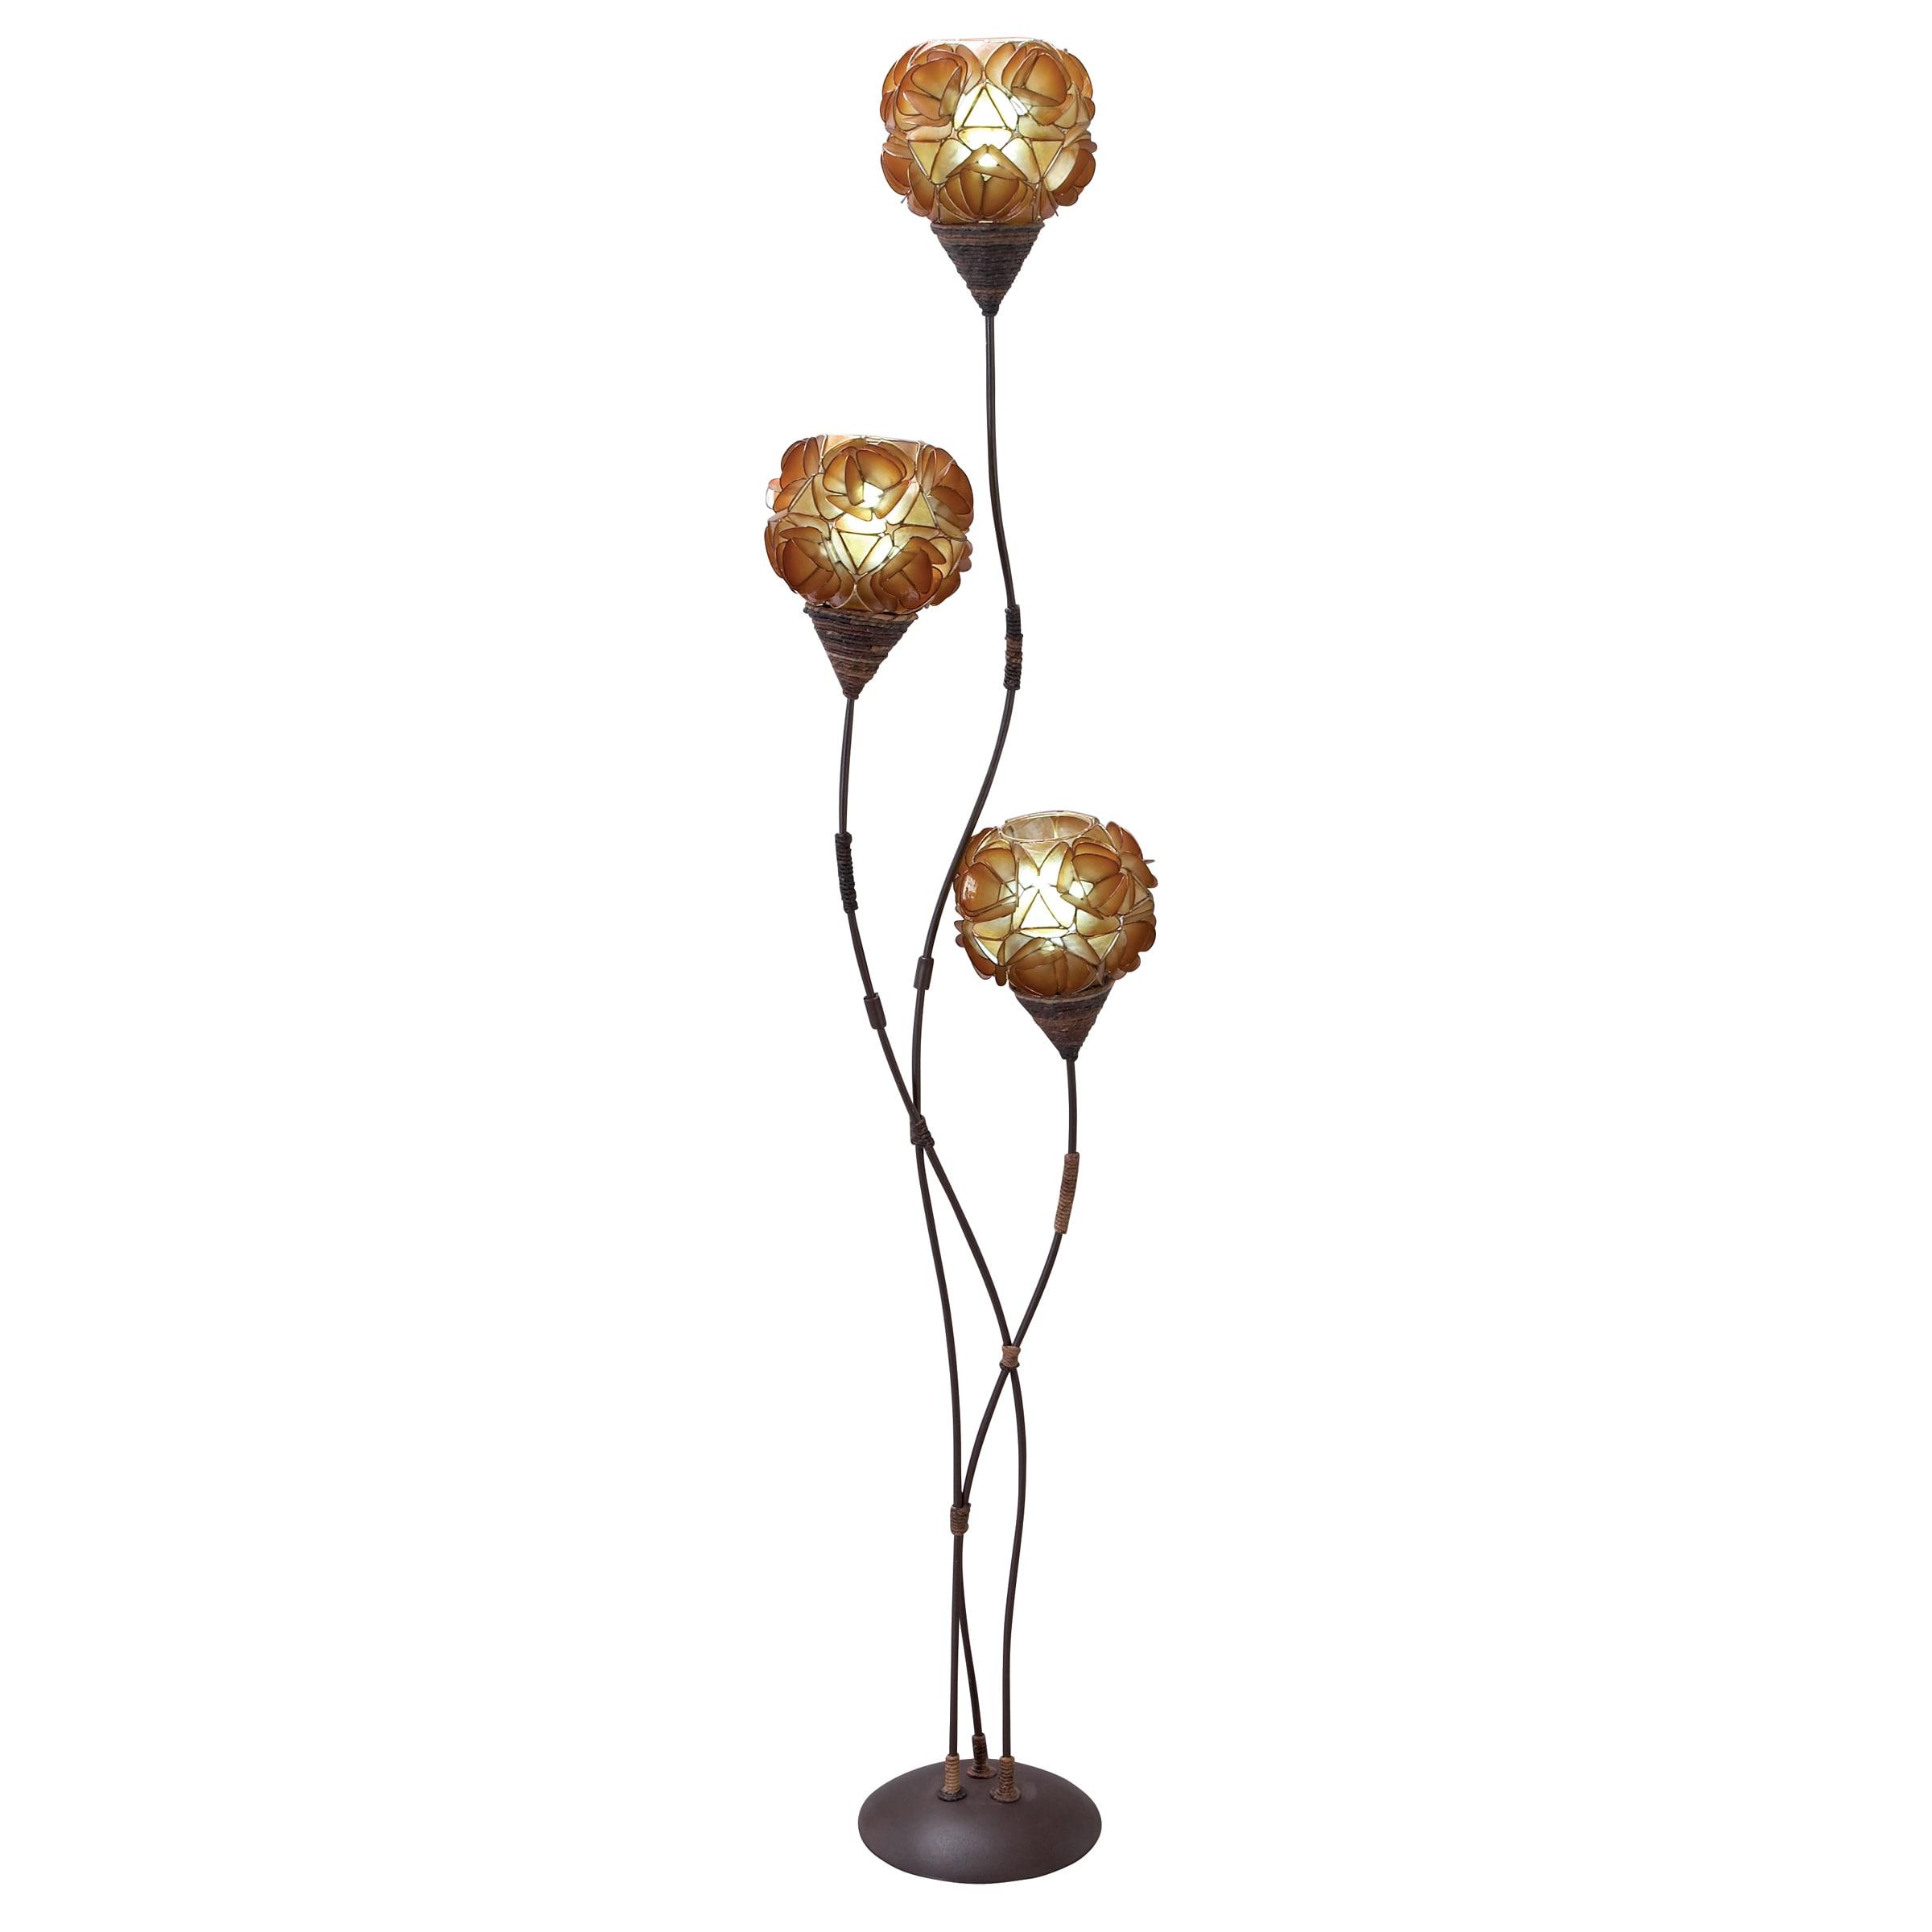 wide cfm pendant lighting in glass floor finish light lamp and large shown capiz champagne inch leaf corbett shell floors item dolce